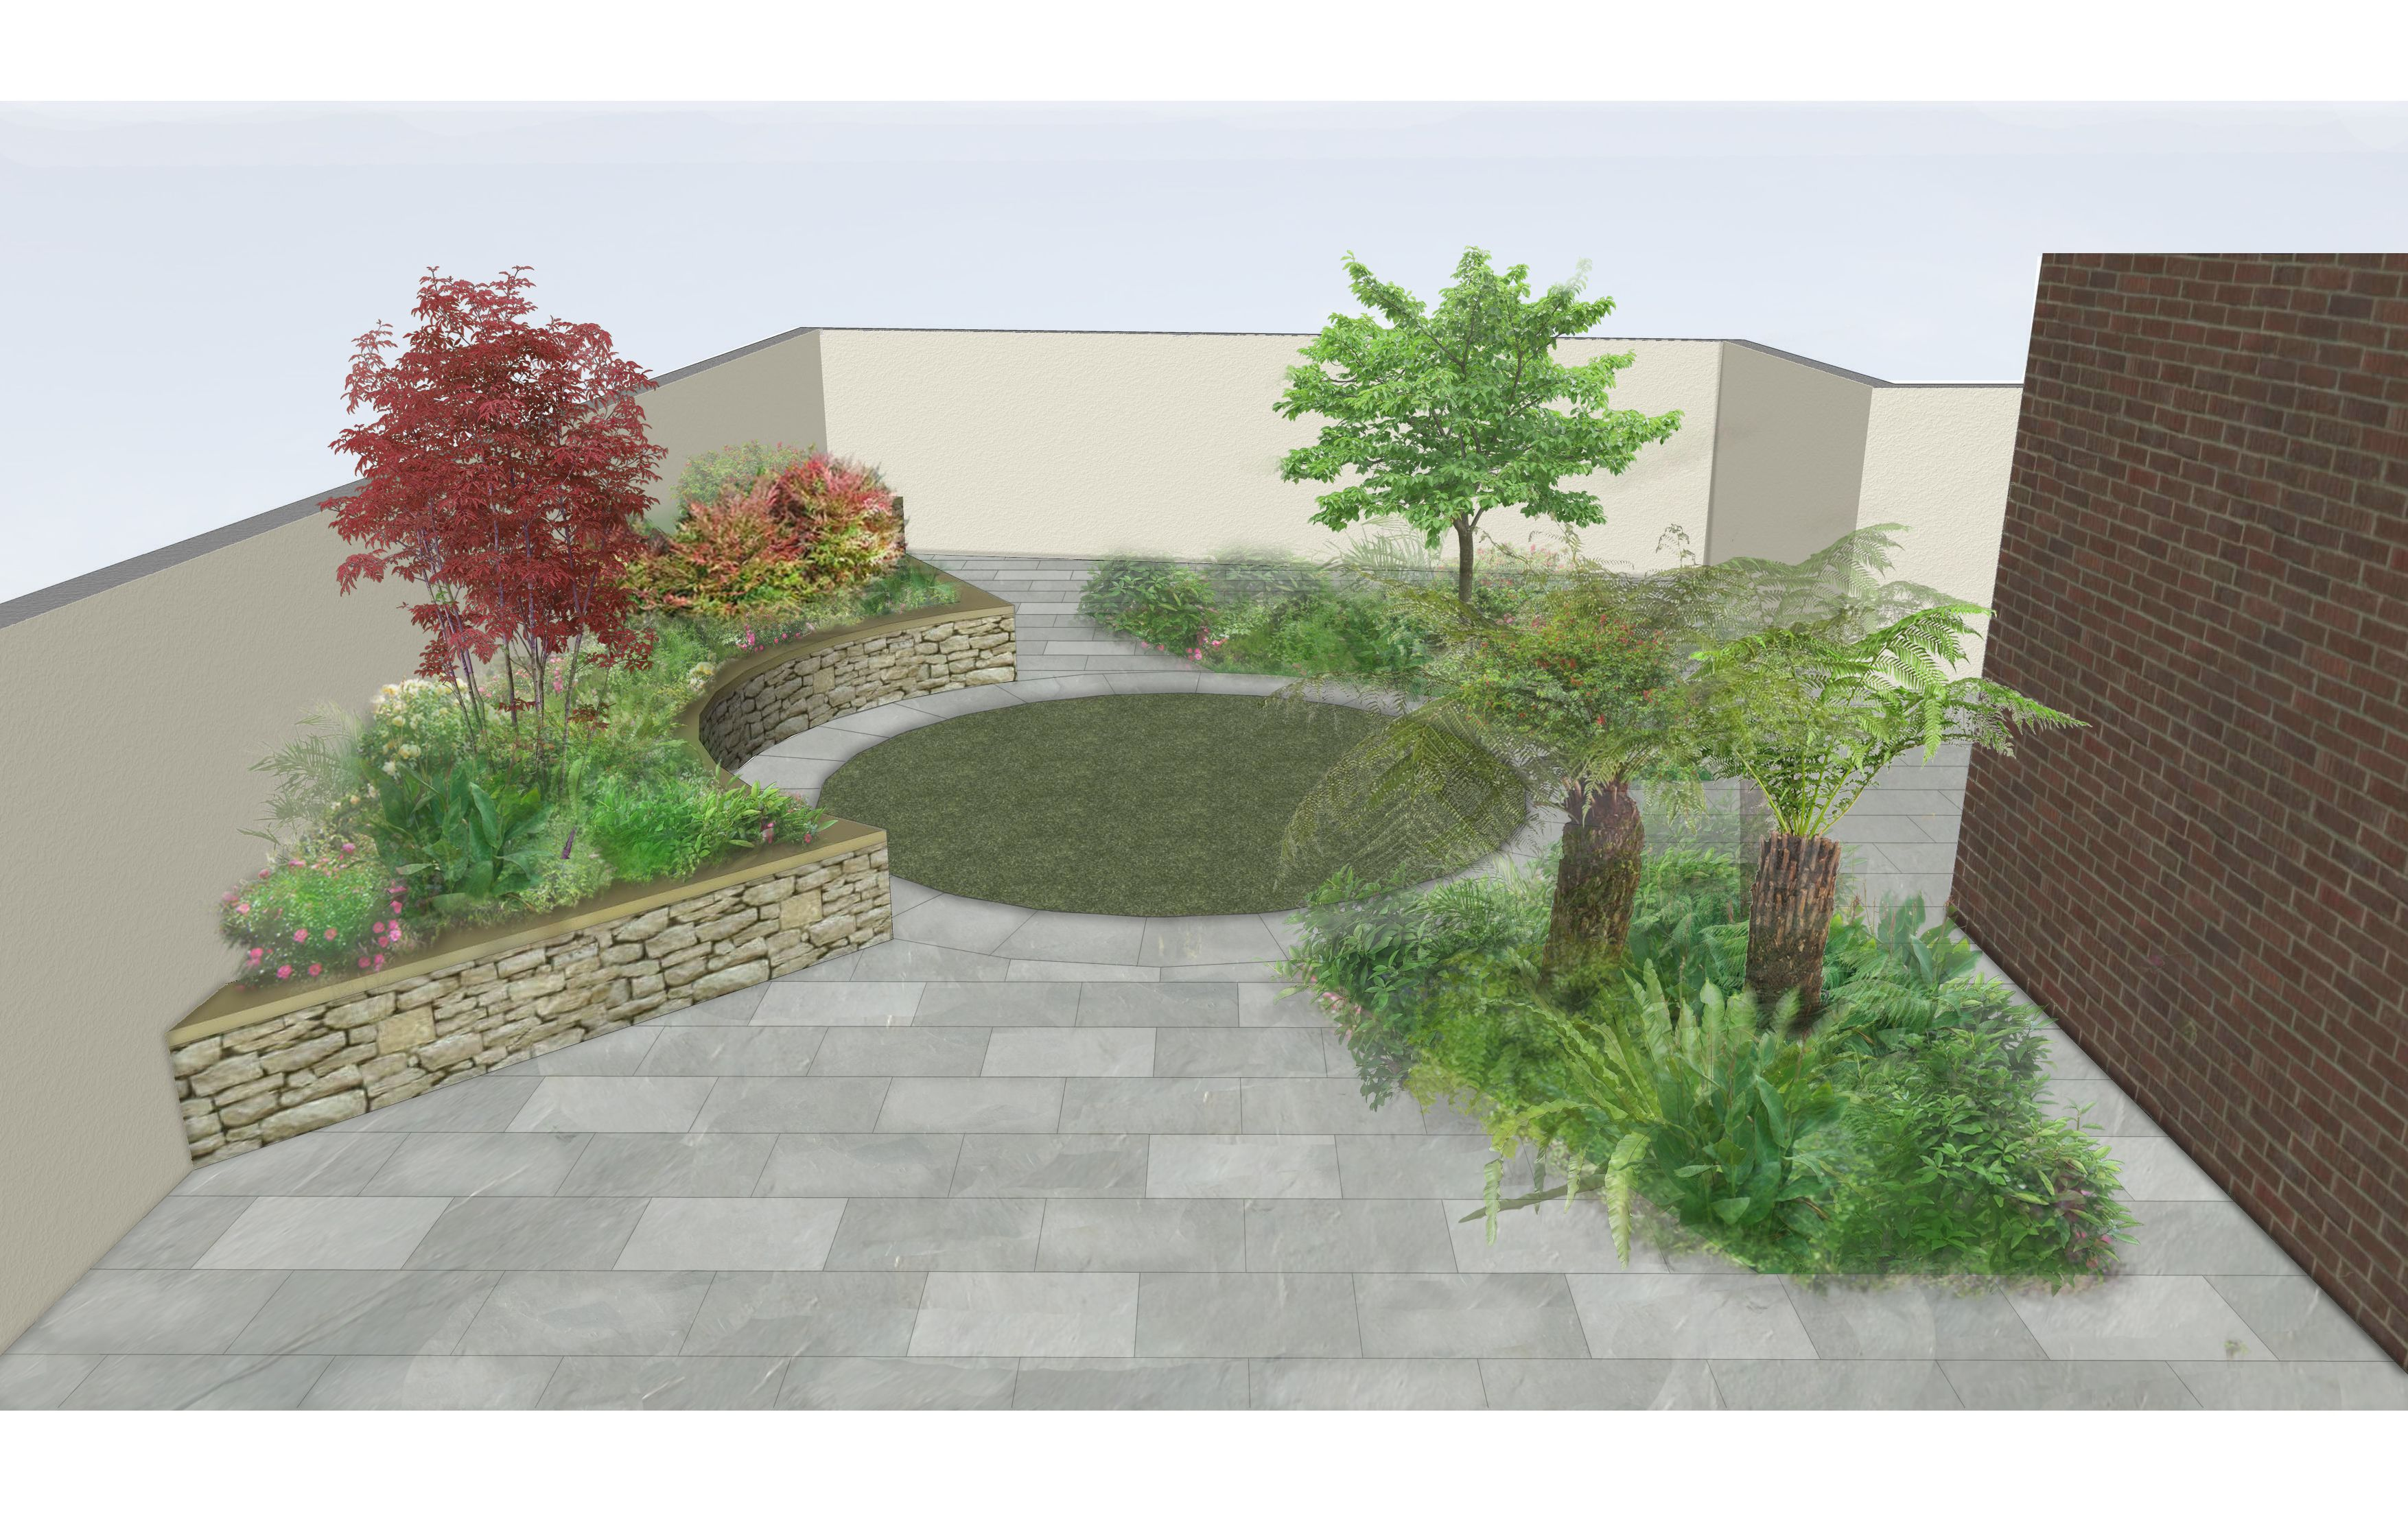 Garden Design For Familygarden In Ranelagh Www Owenchubblandscapers Com Dublin Ireland We Design We Patio Ideas Ireland Garden Design Landscape Design